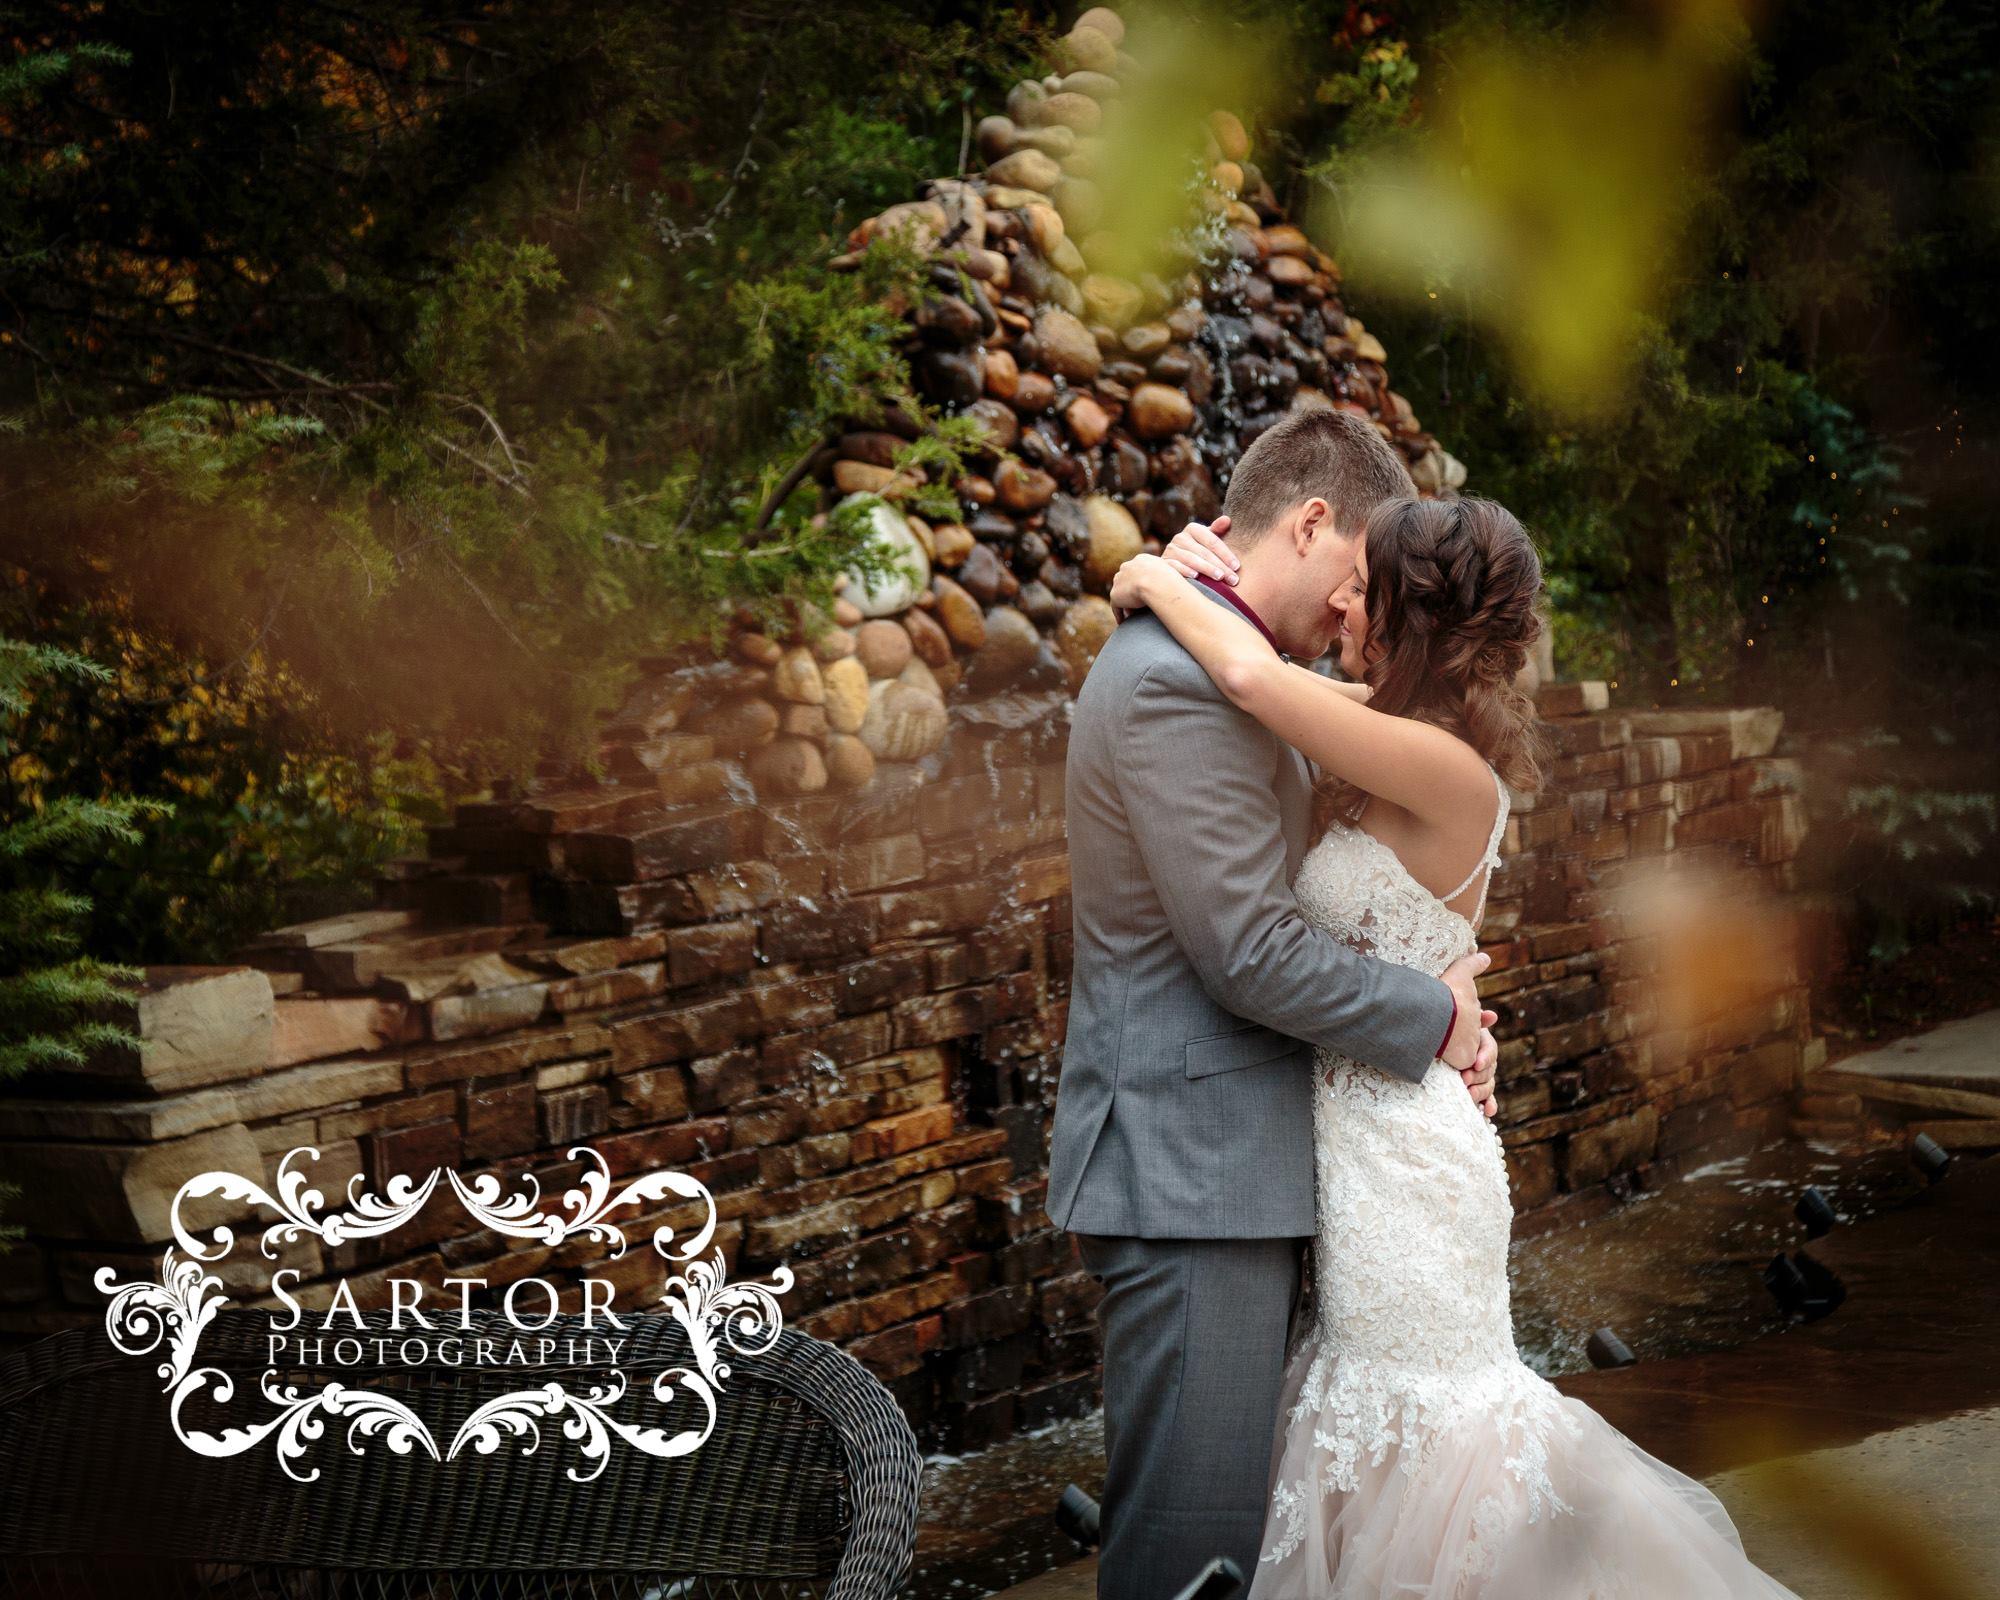 The wedding garden wedding event venue carbondale - The wedding garden carbondale il ...